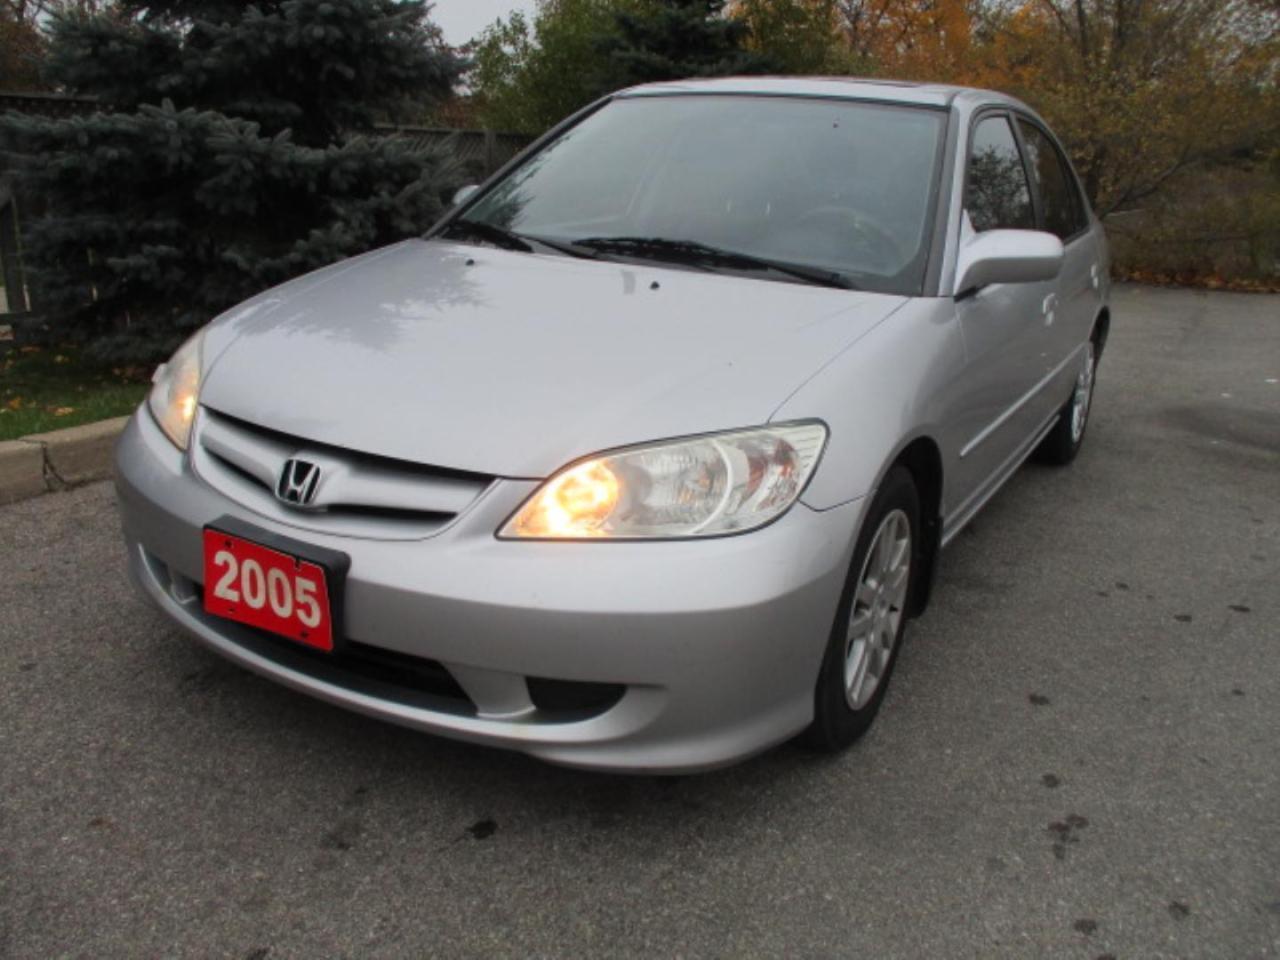 2005 Honda Civic LX Sedan w/ Front Side Airbags